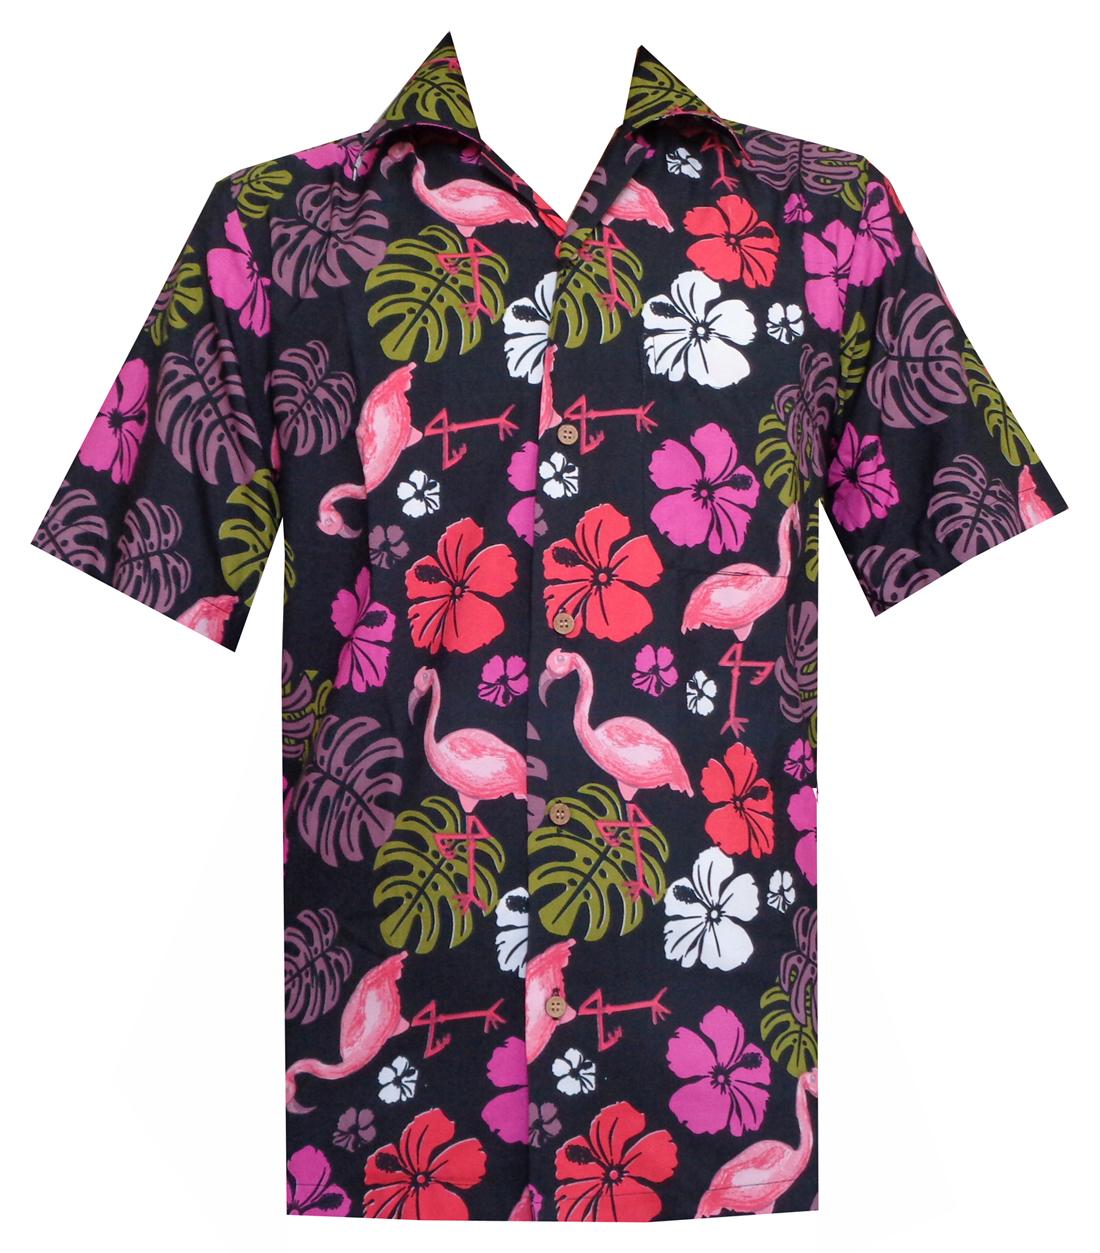 3583dac8b Hawaiian Shirts Mens Flamingo Leaf Print Beach Aloha Party Black L ...